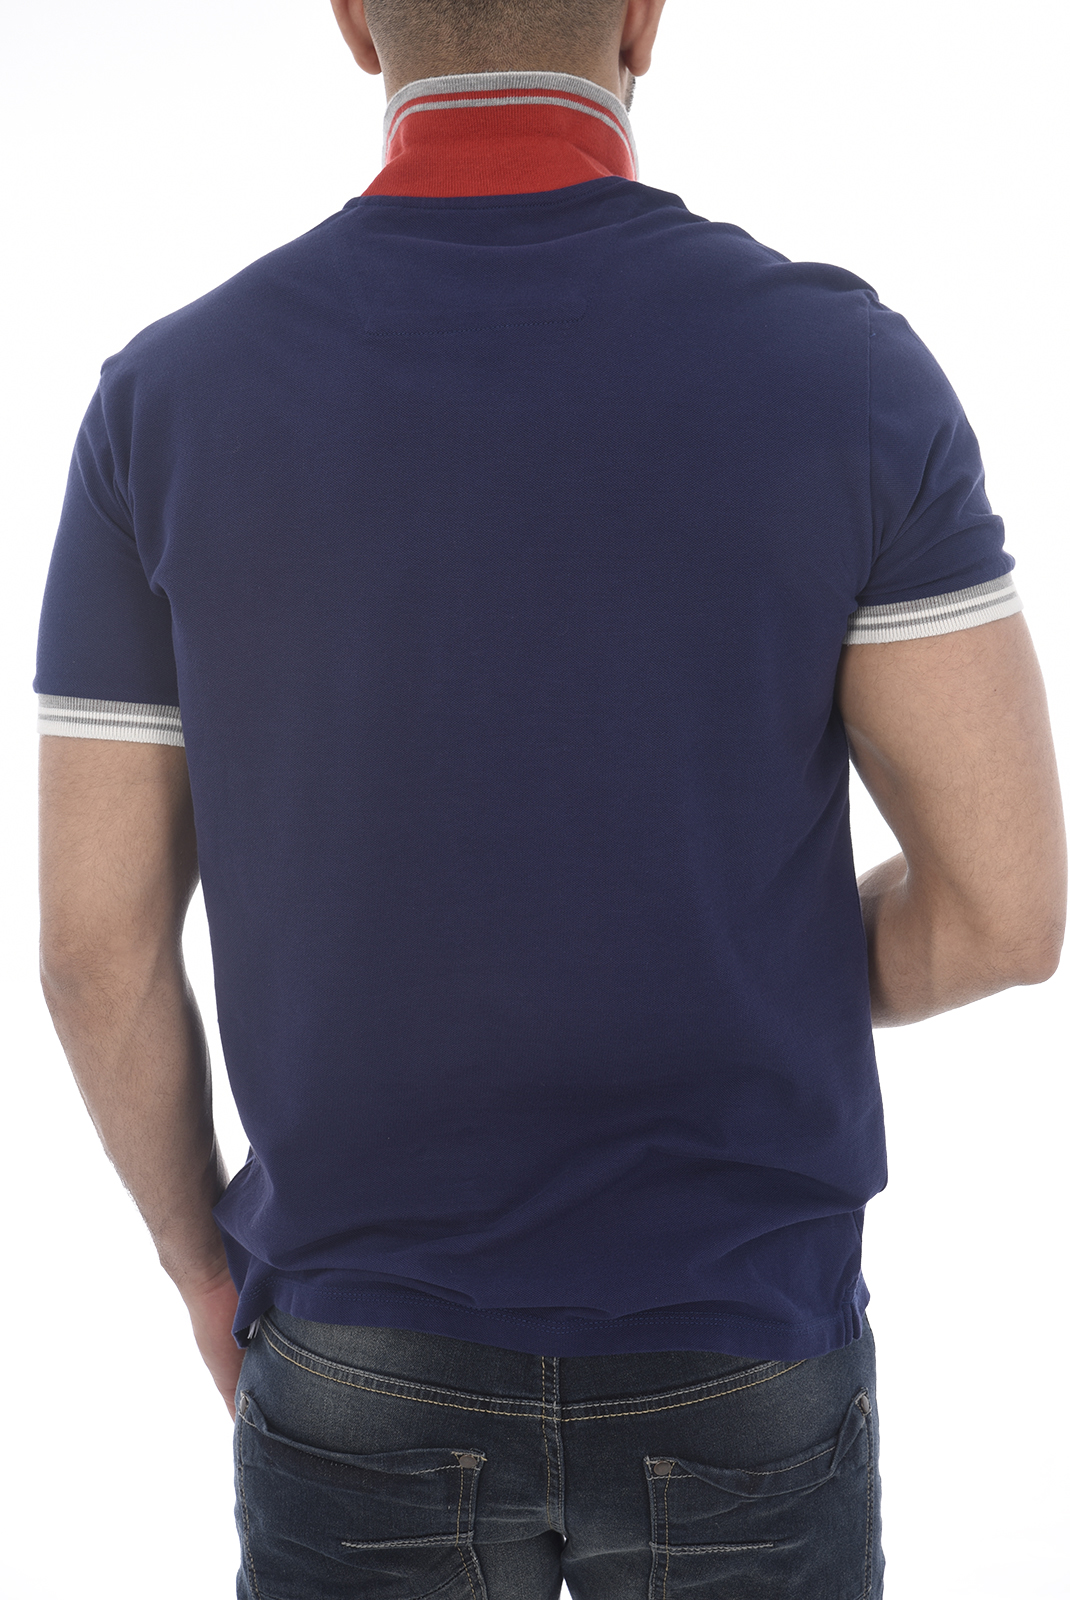 Guess jeans U82I05 JR02F U138 COSMO BLUE